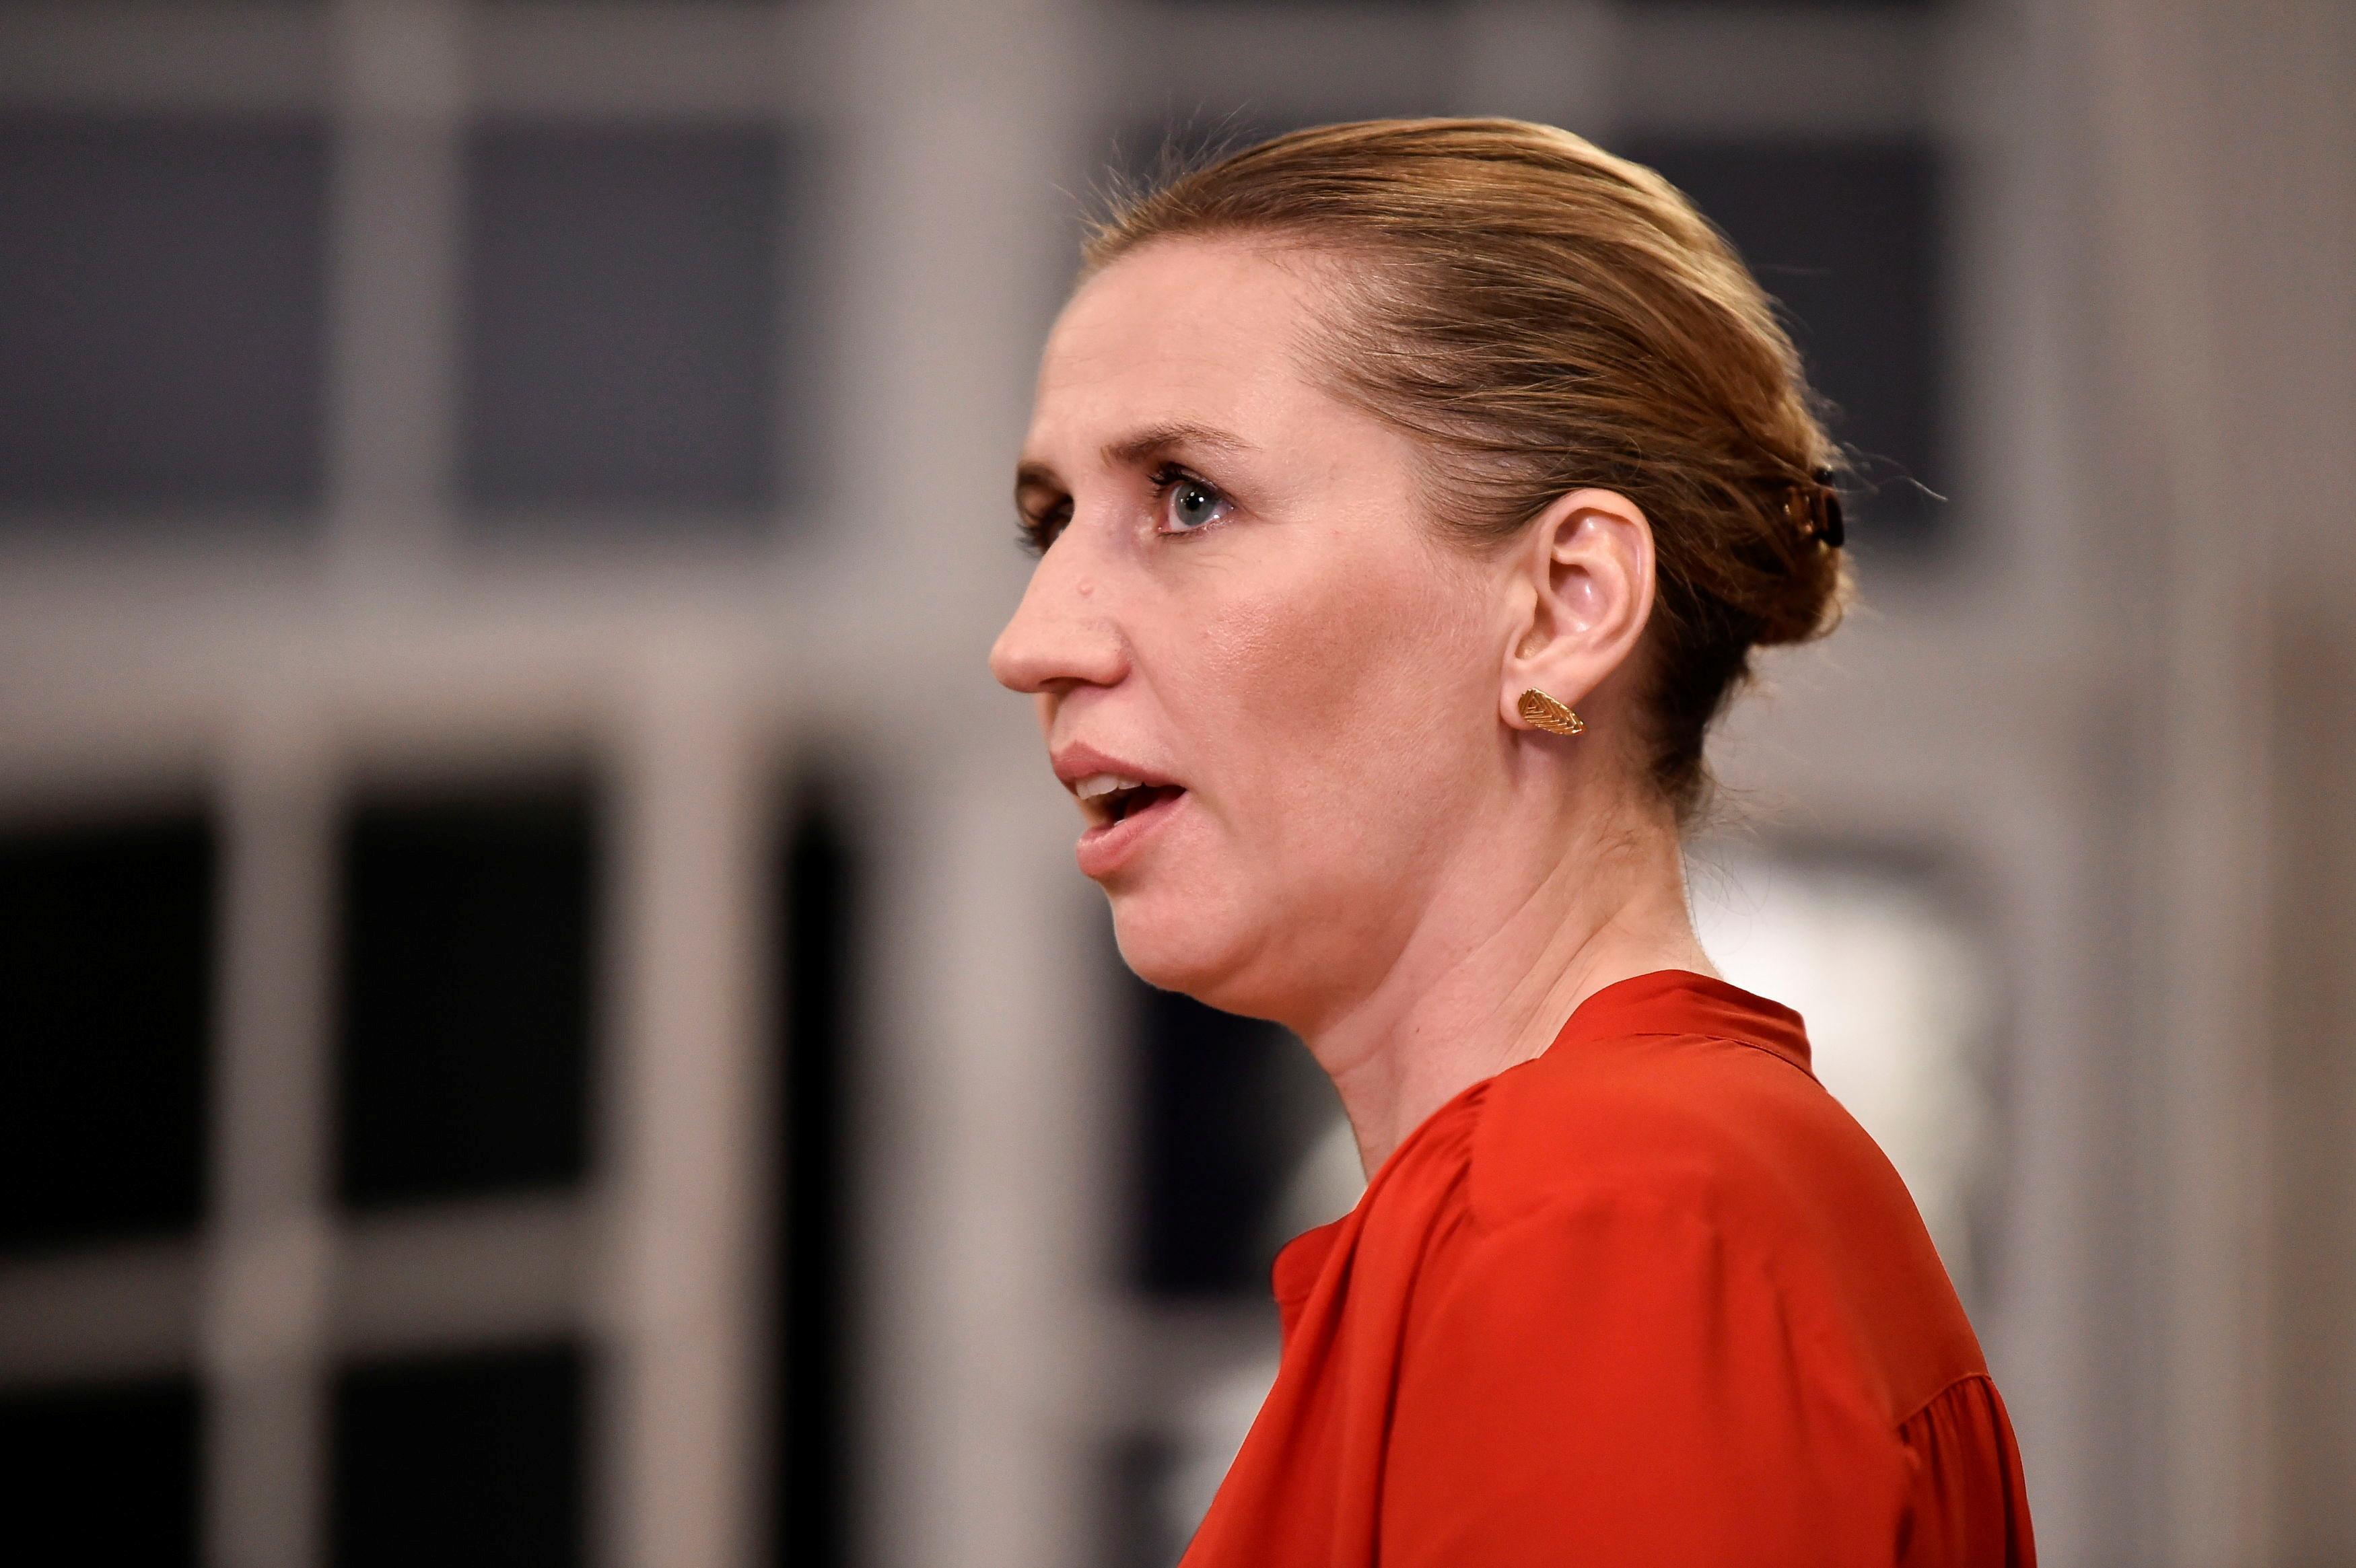 Denmark's next PM says she will nominate EU Commissioner Vestager...